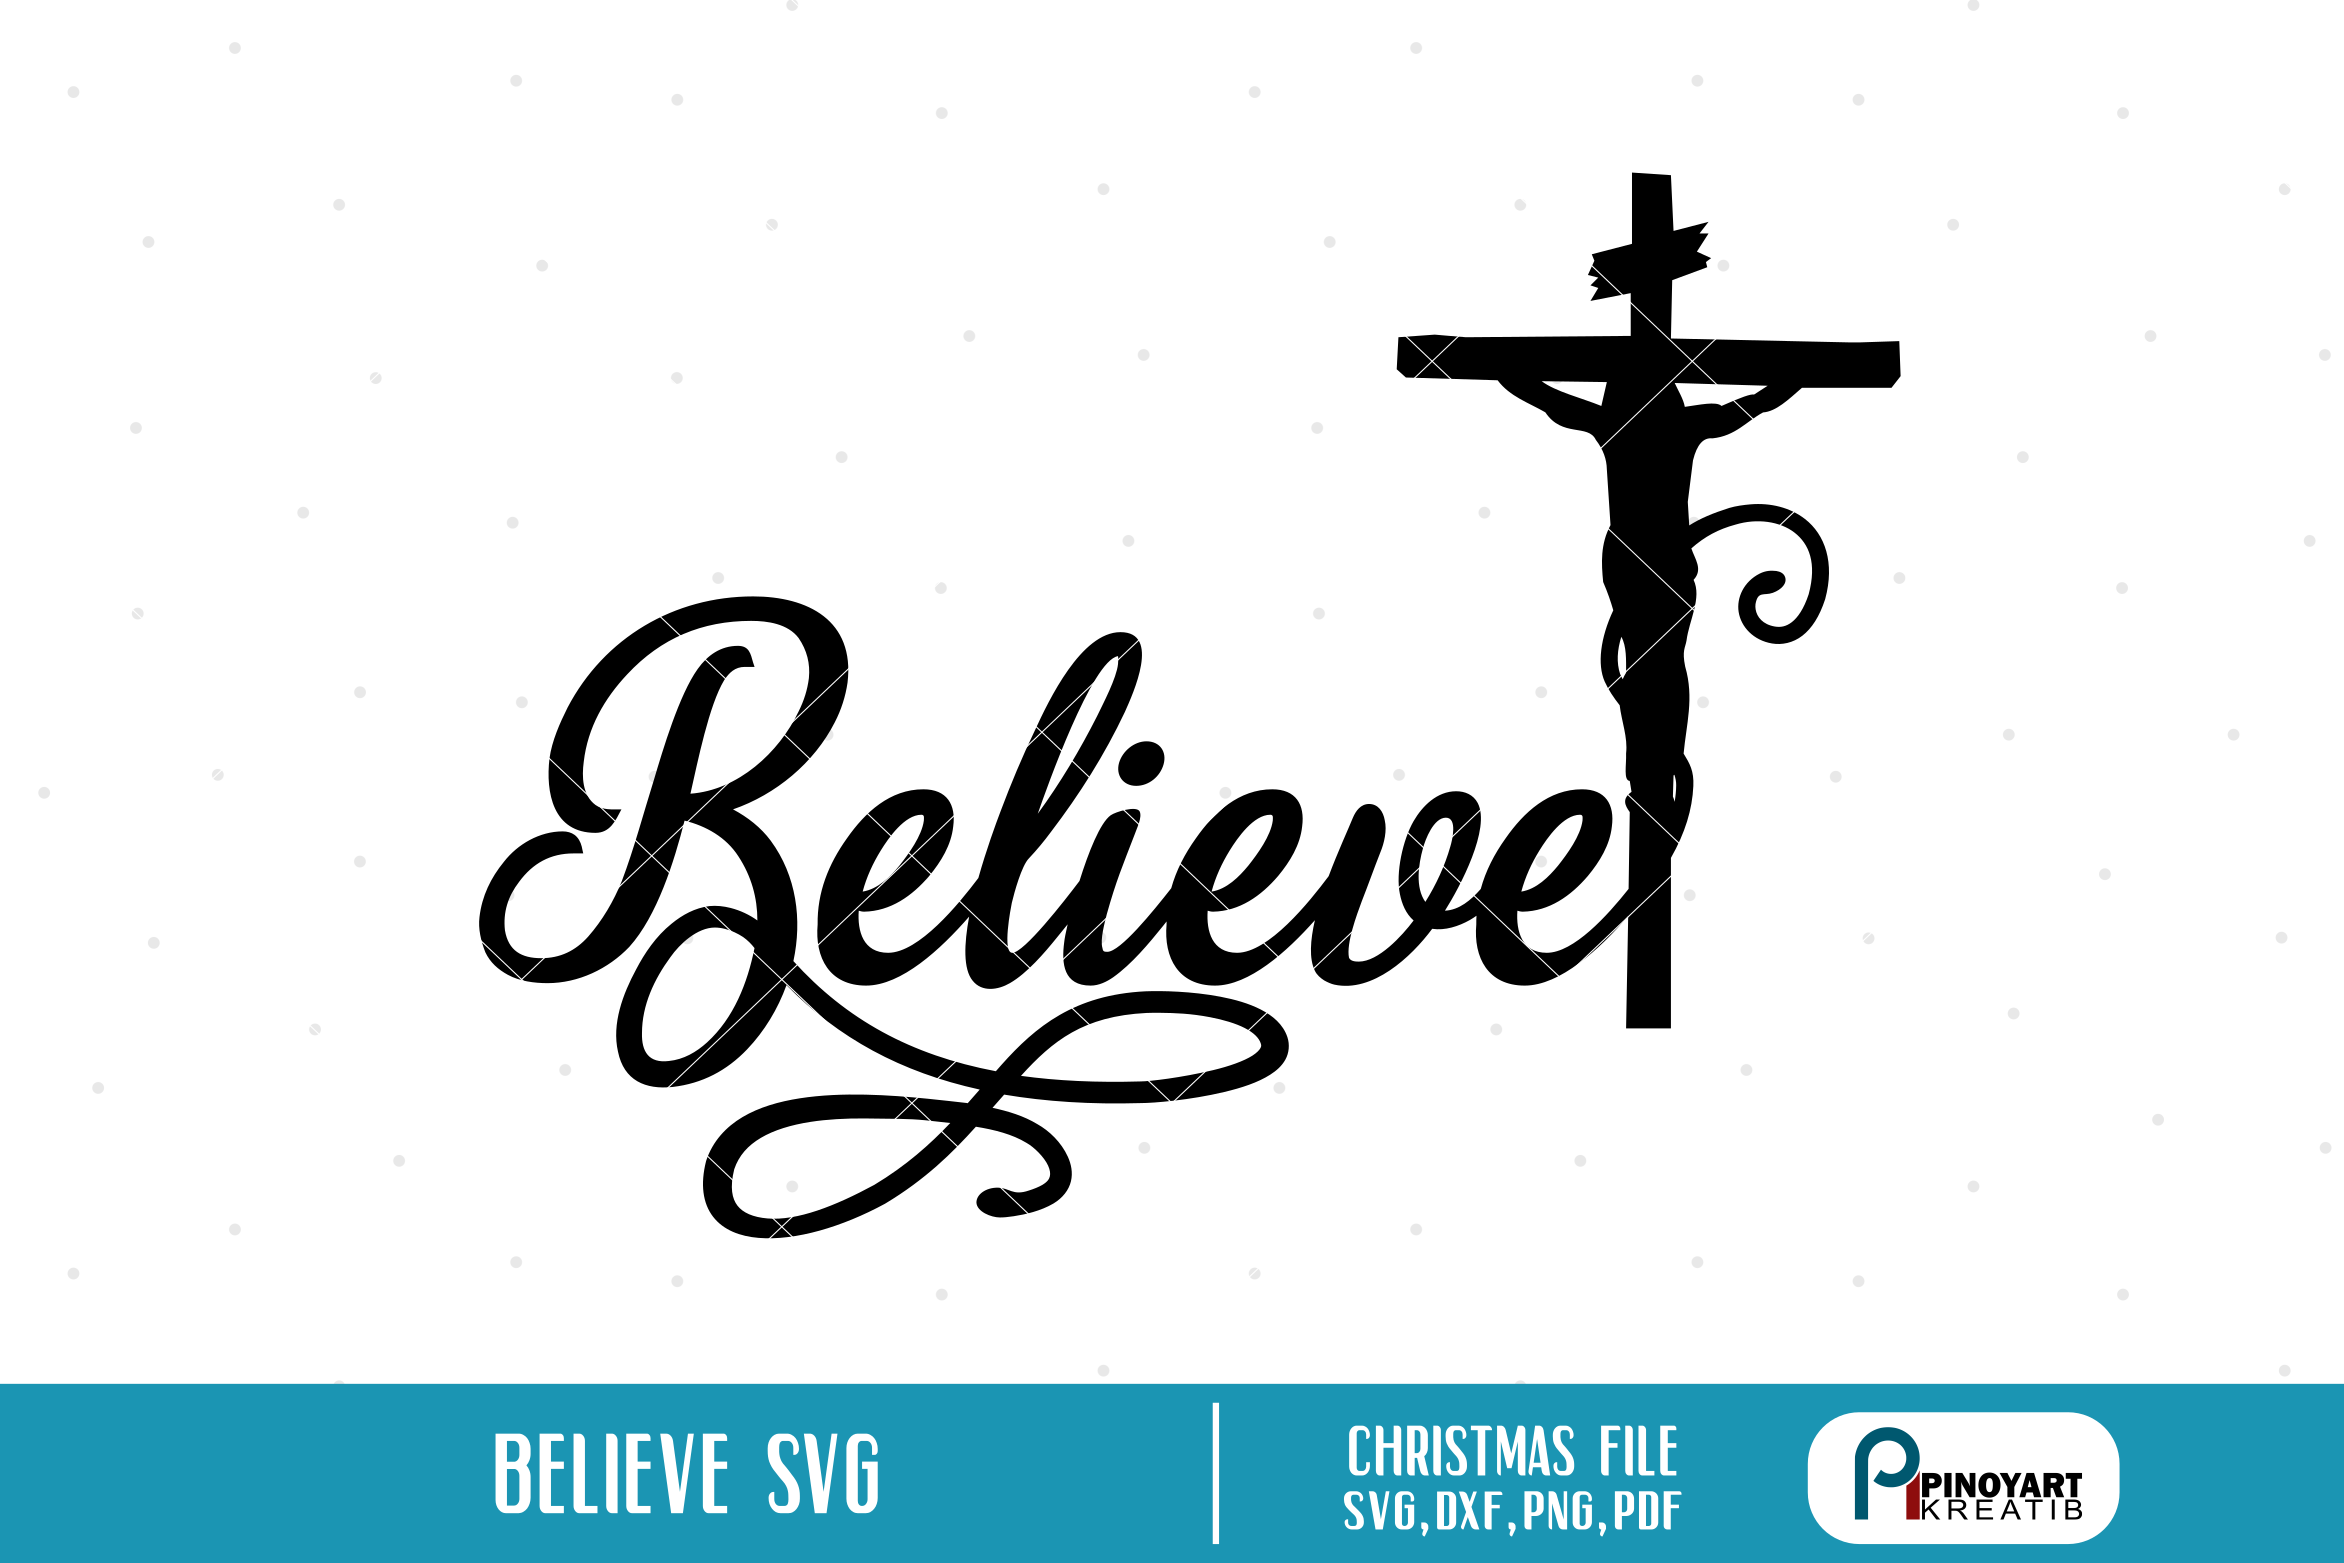 Believe svg.